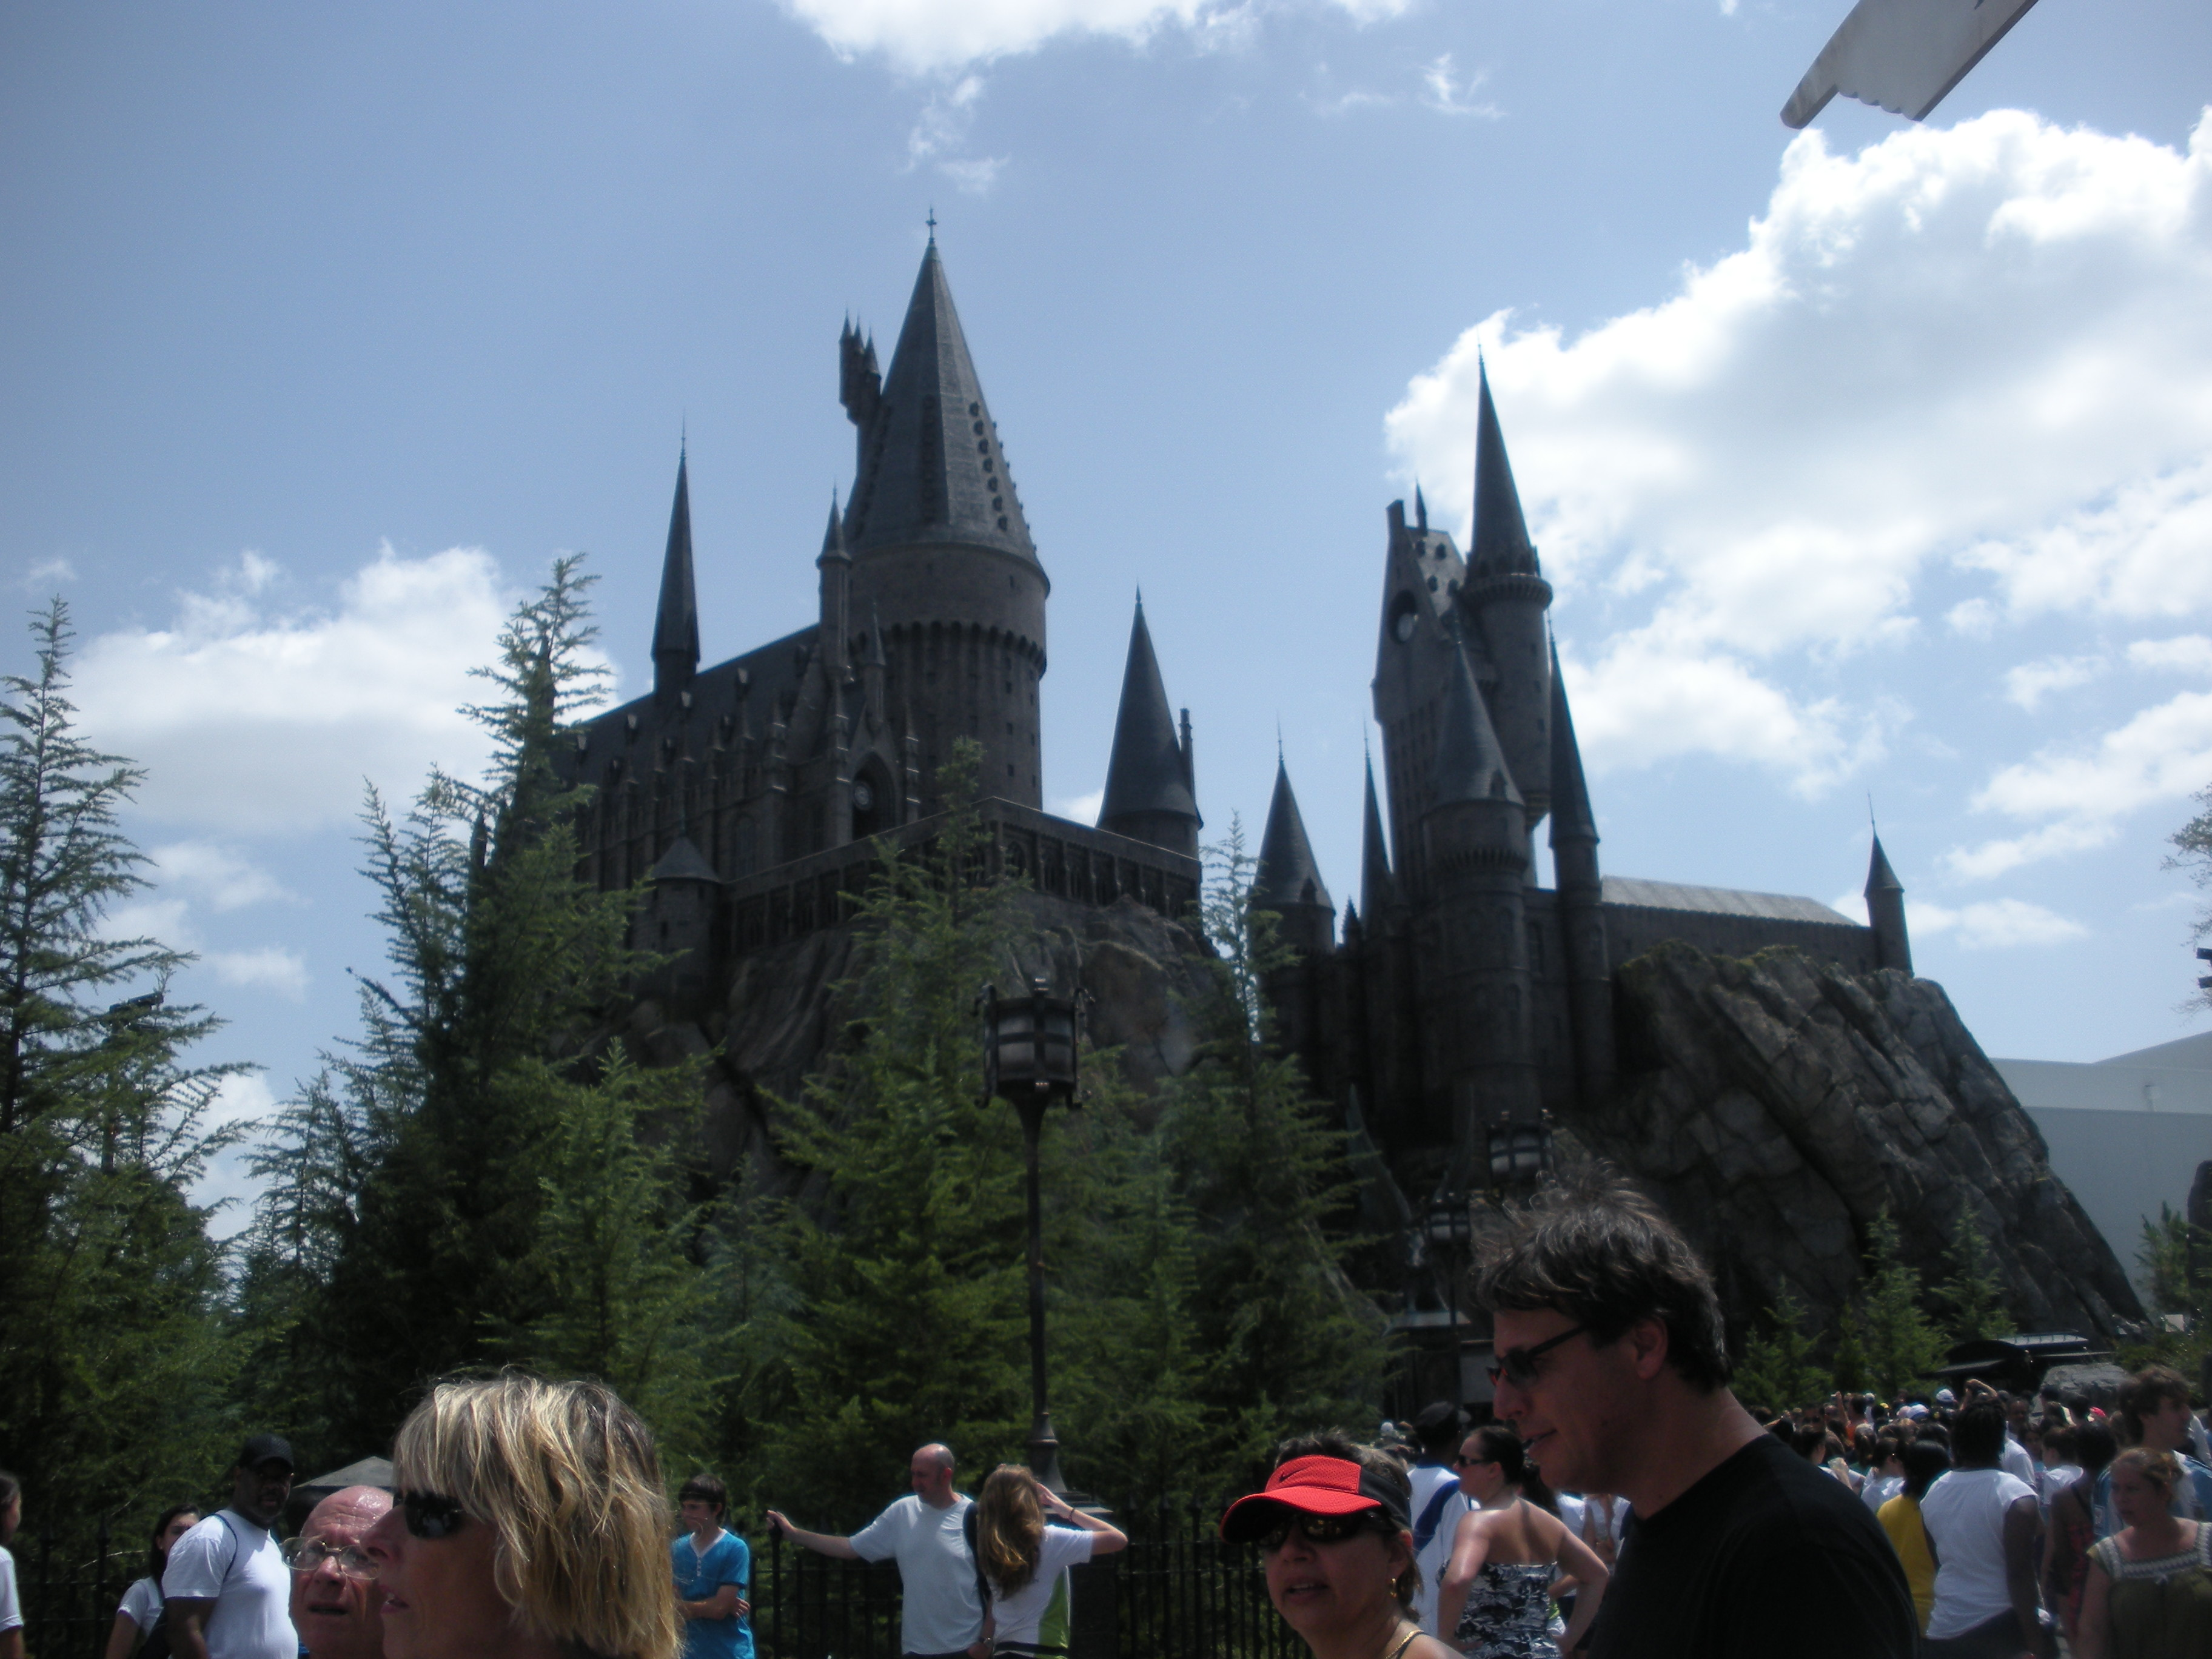 Hogwarts Castle Movie Location Images